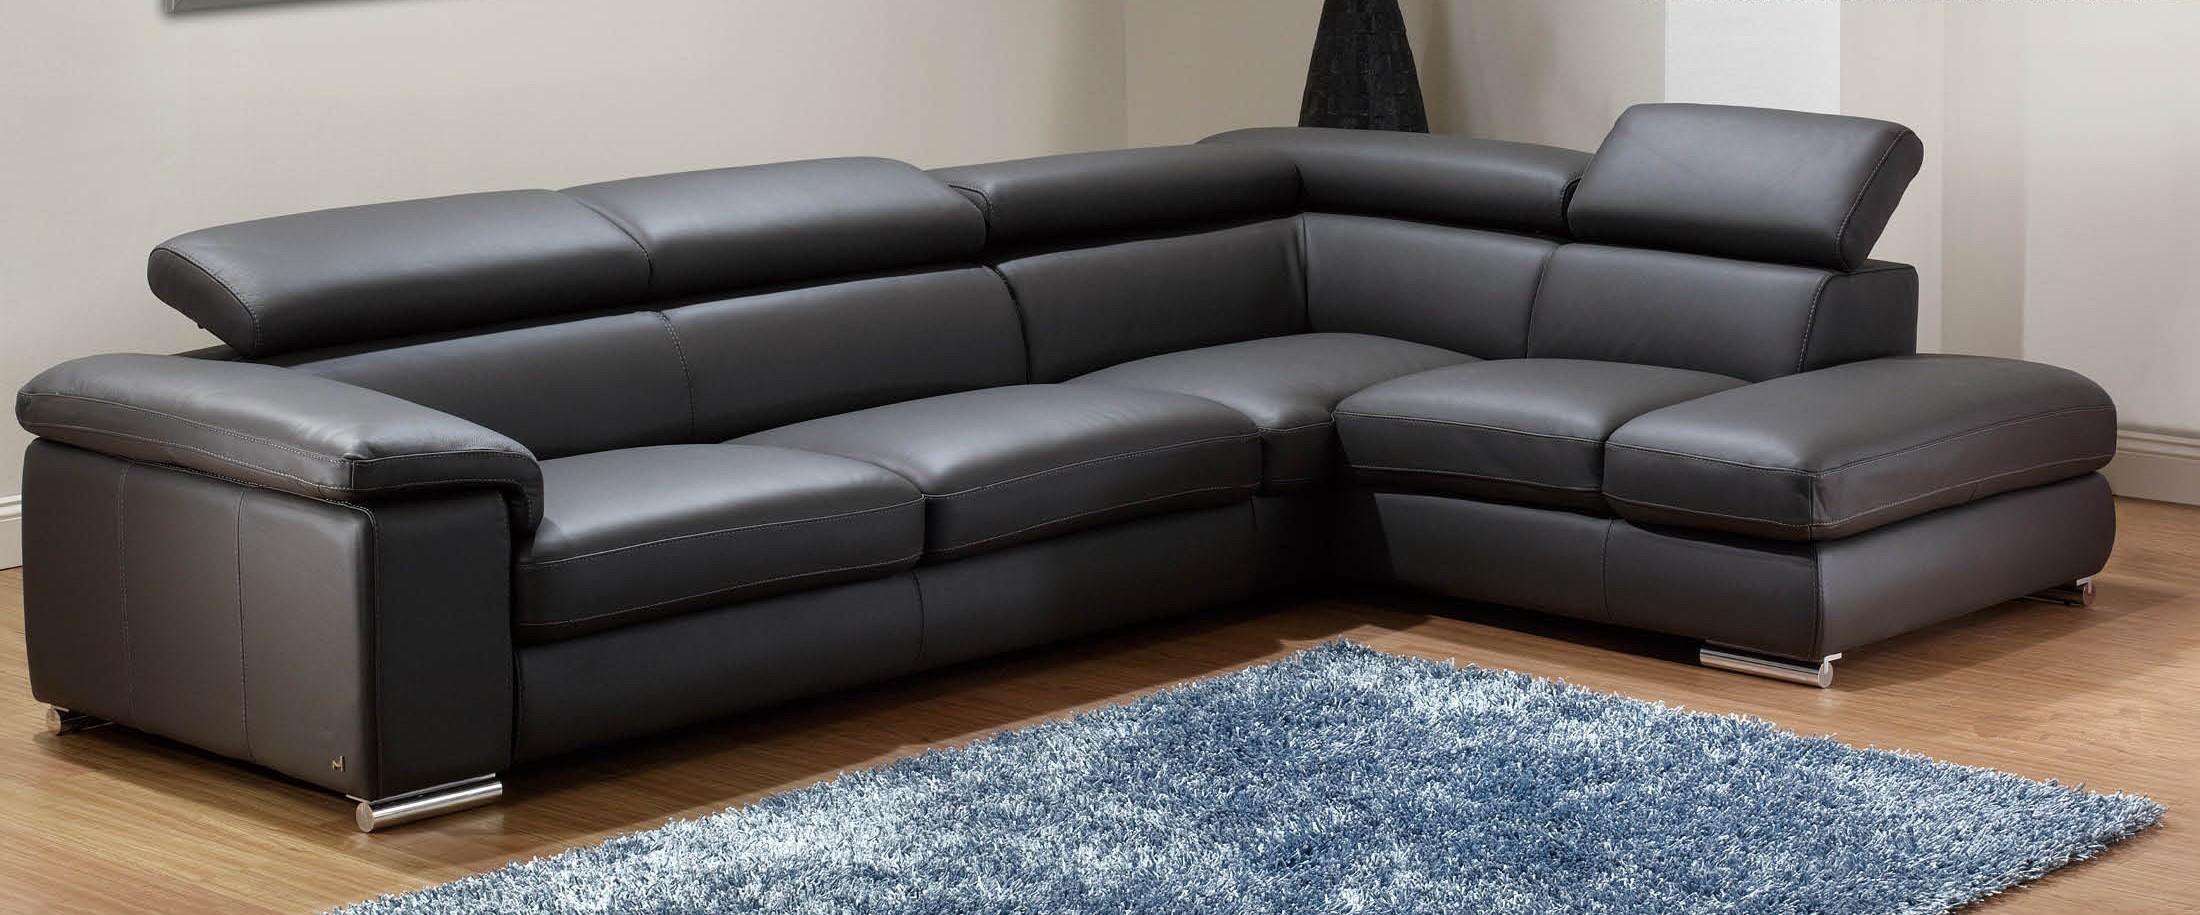 Sofas : Marvelous Sectional Sleeper Sofa Italian Sofa Leather Regarding Black Leather Sectional Sleeper Sofas (View 13 of 21)